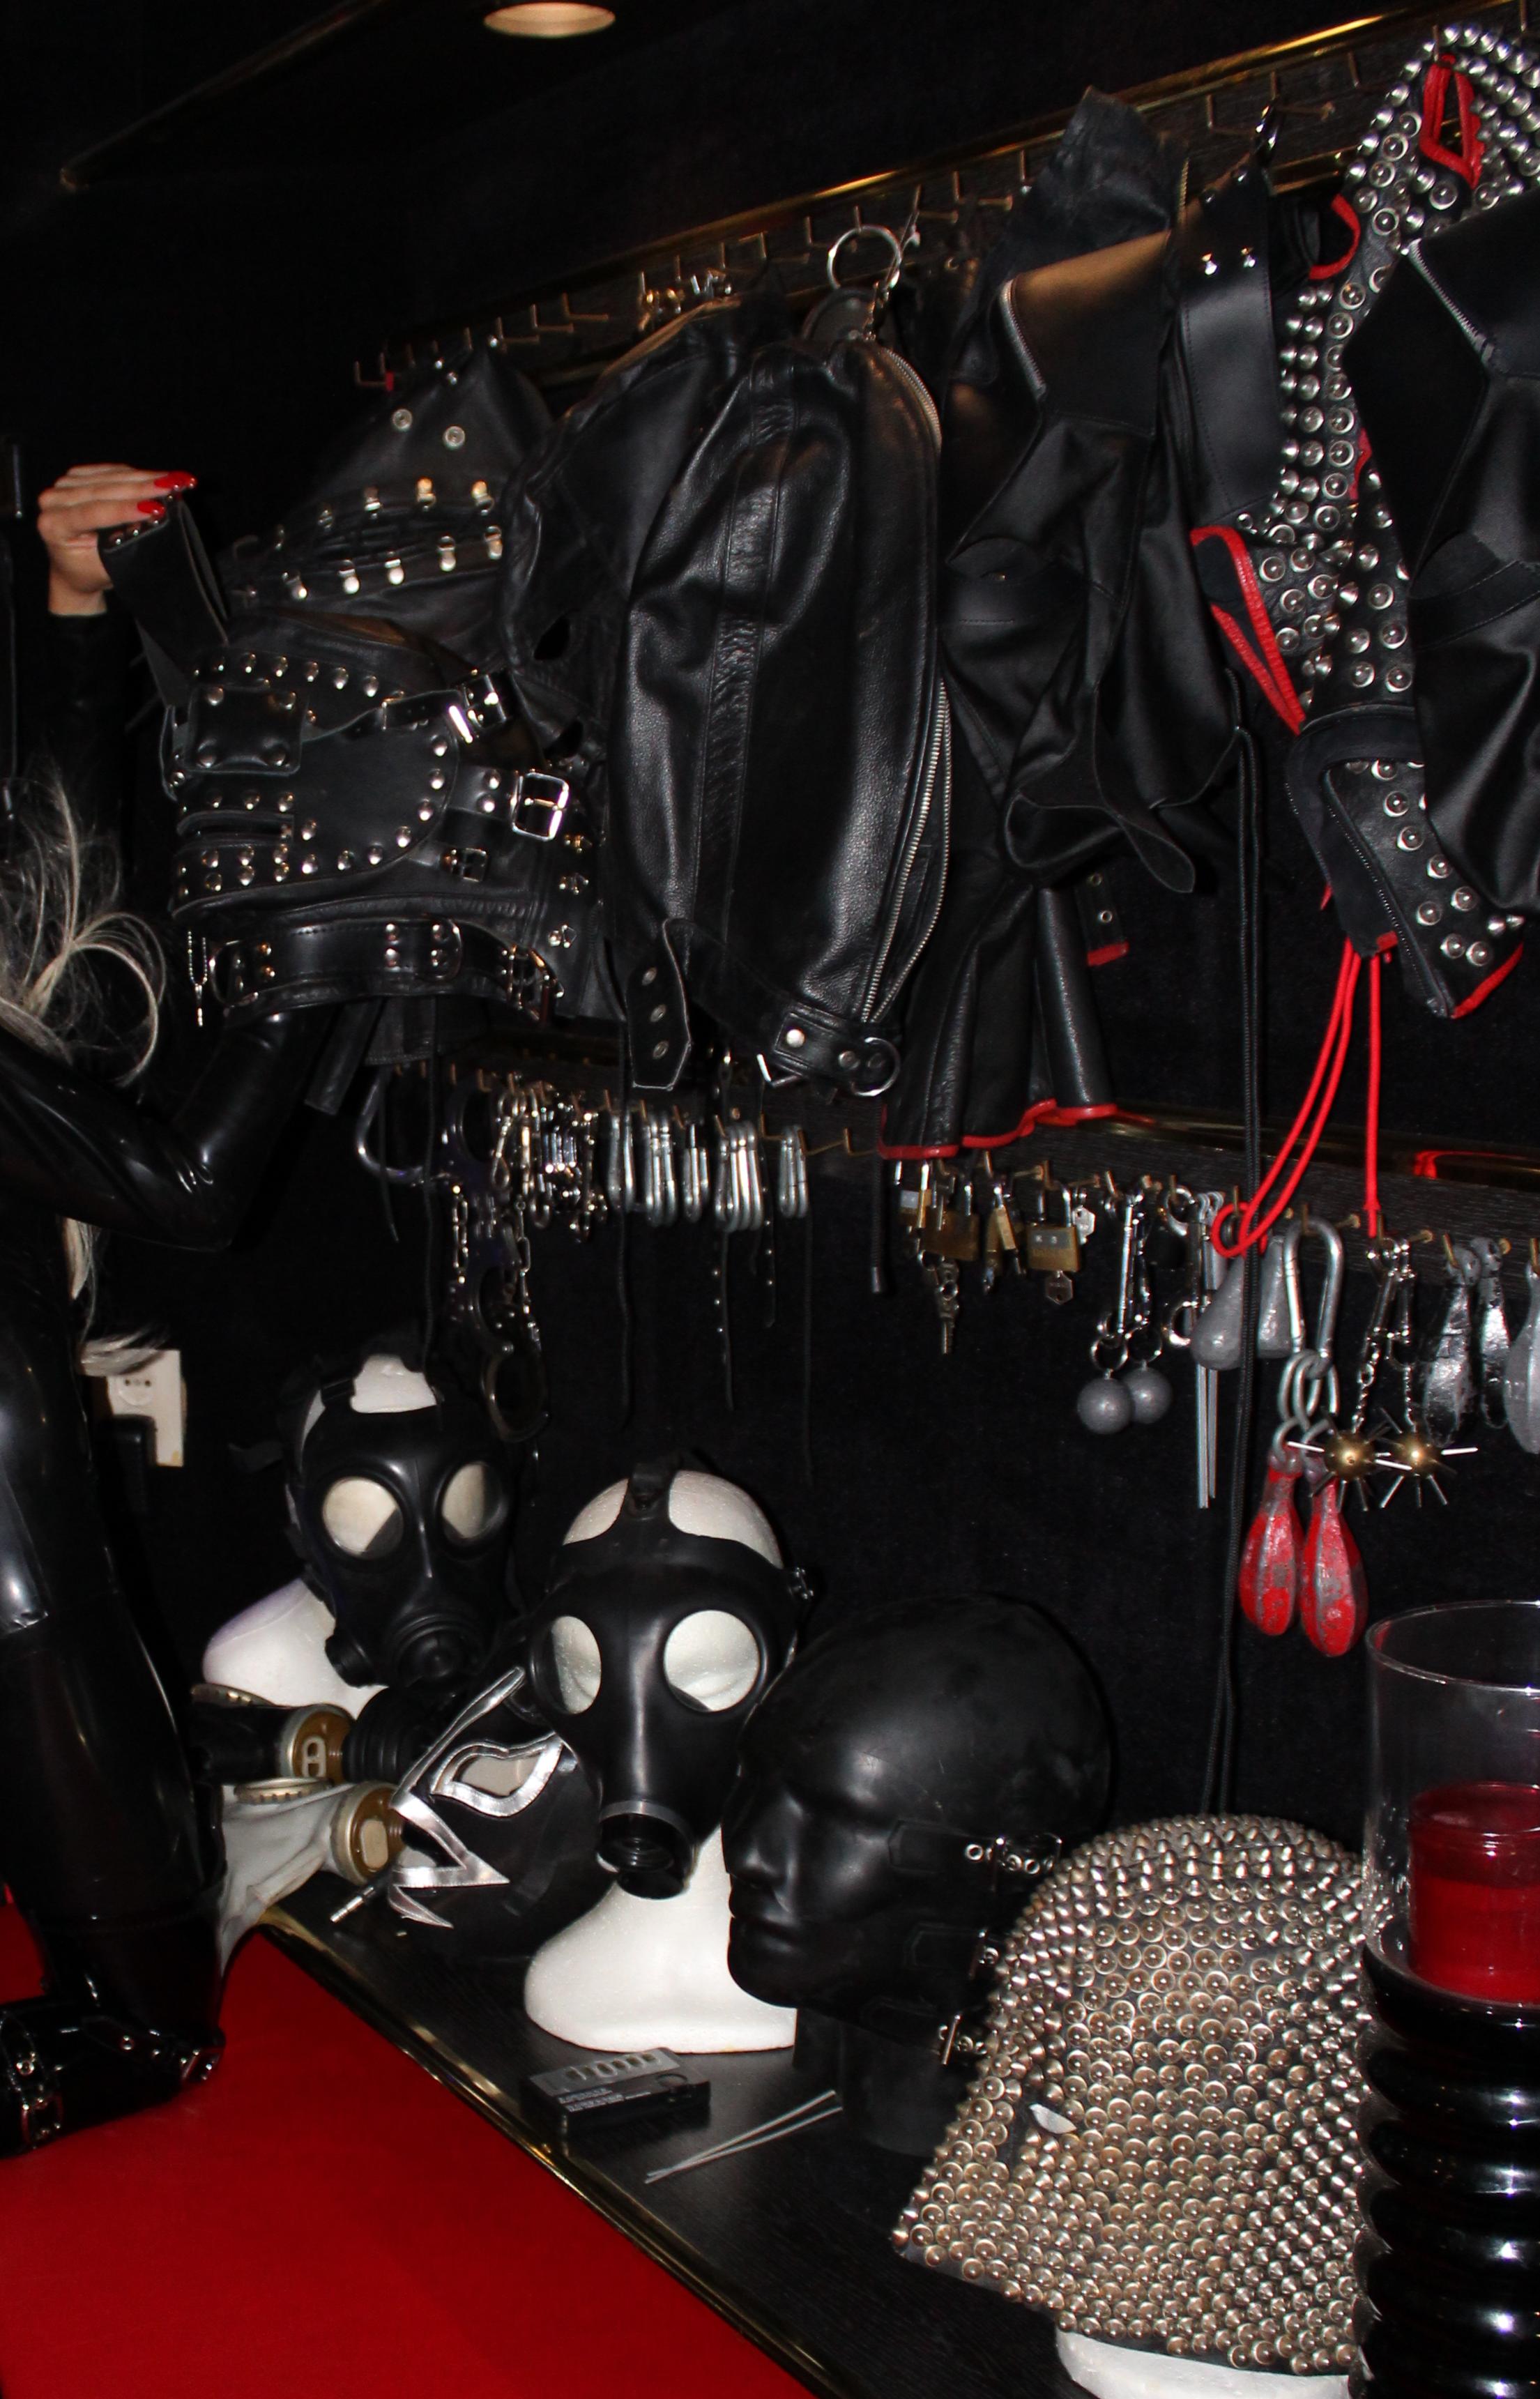 Mistress Emma The Hague, Meesteres Emma Den Haag, Masks, Sensory deprivation